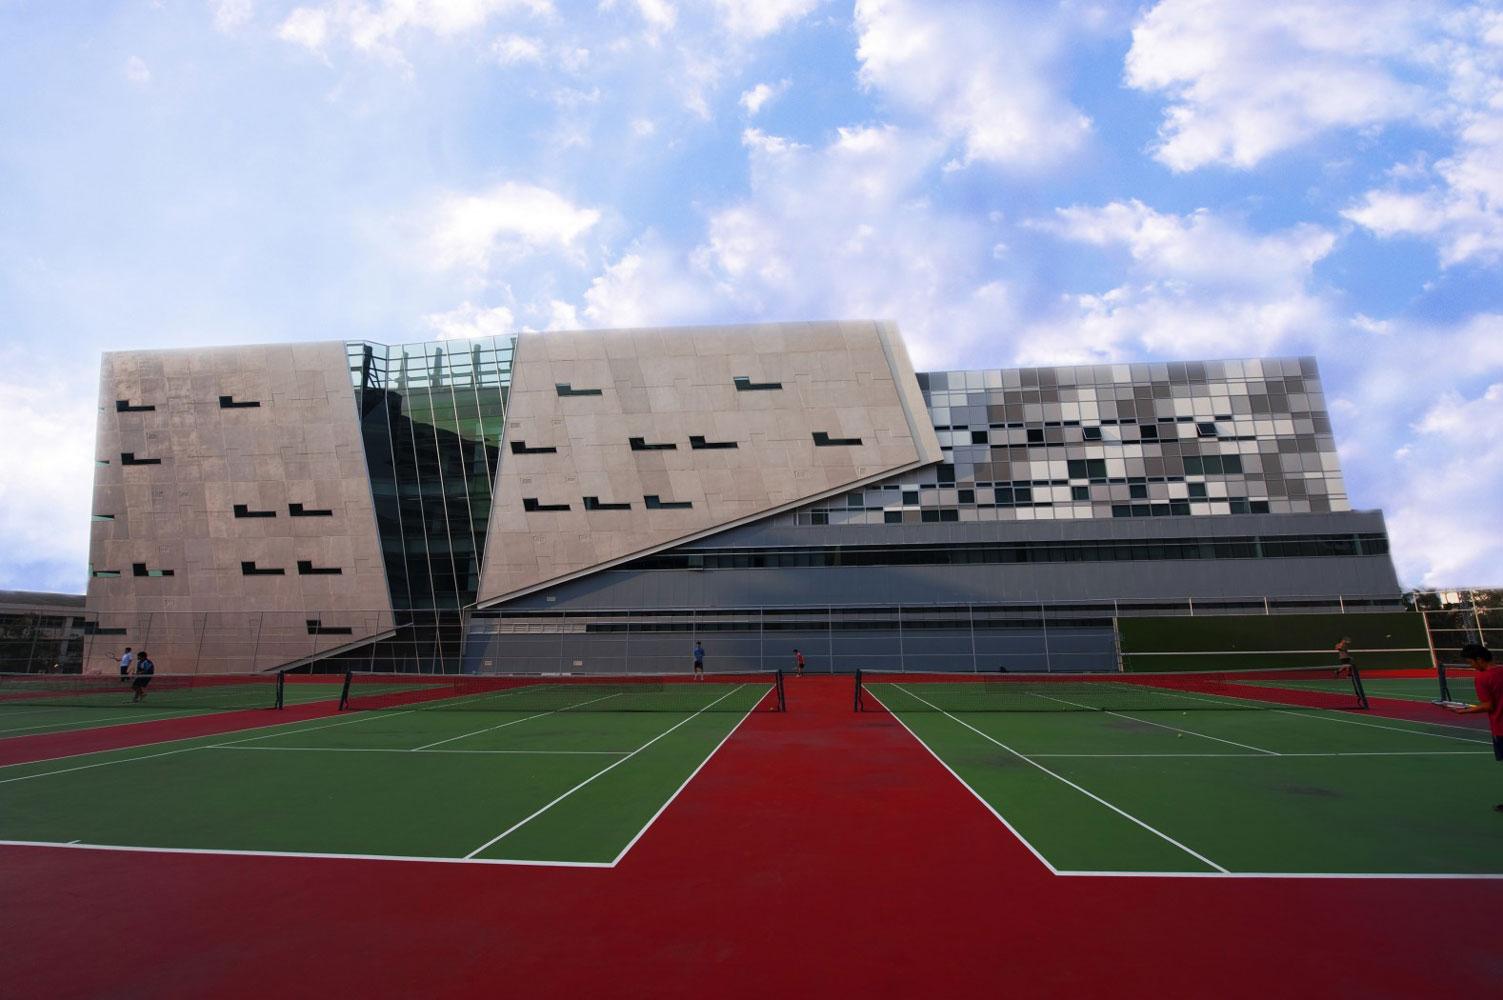 Badminton court filming location in Bangkok Thailand